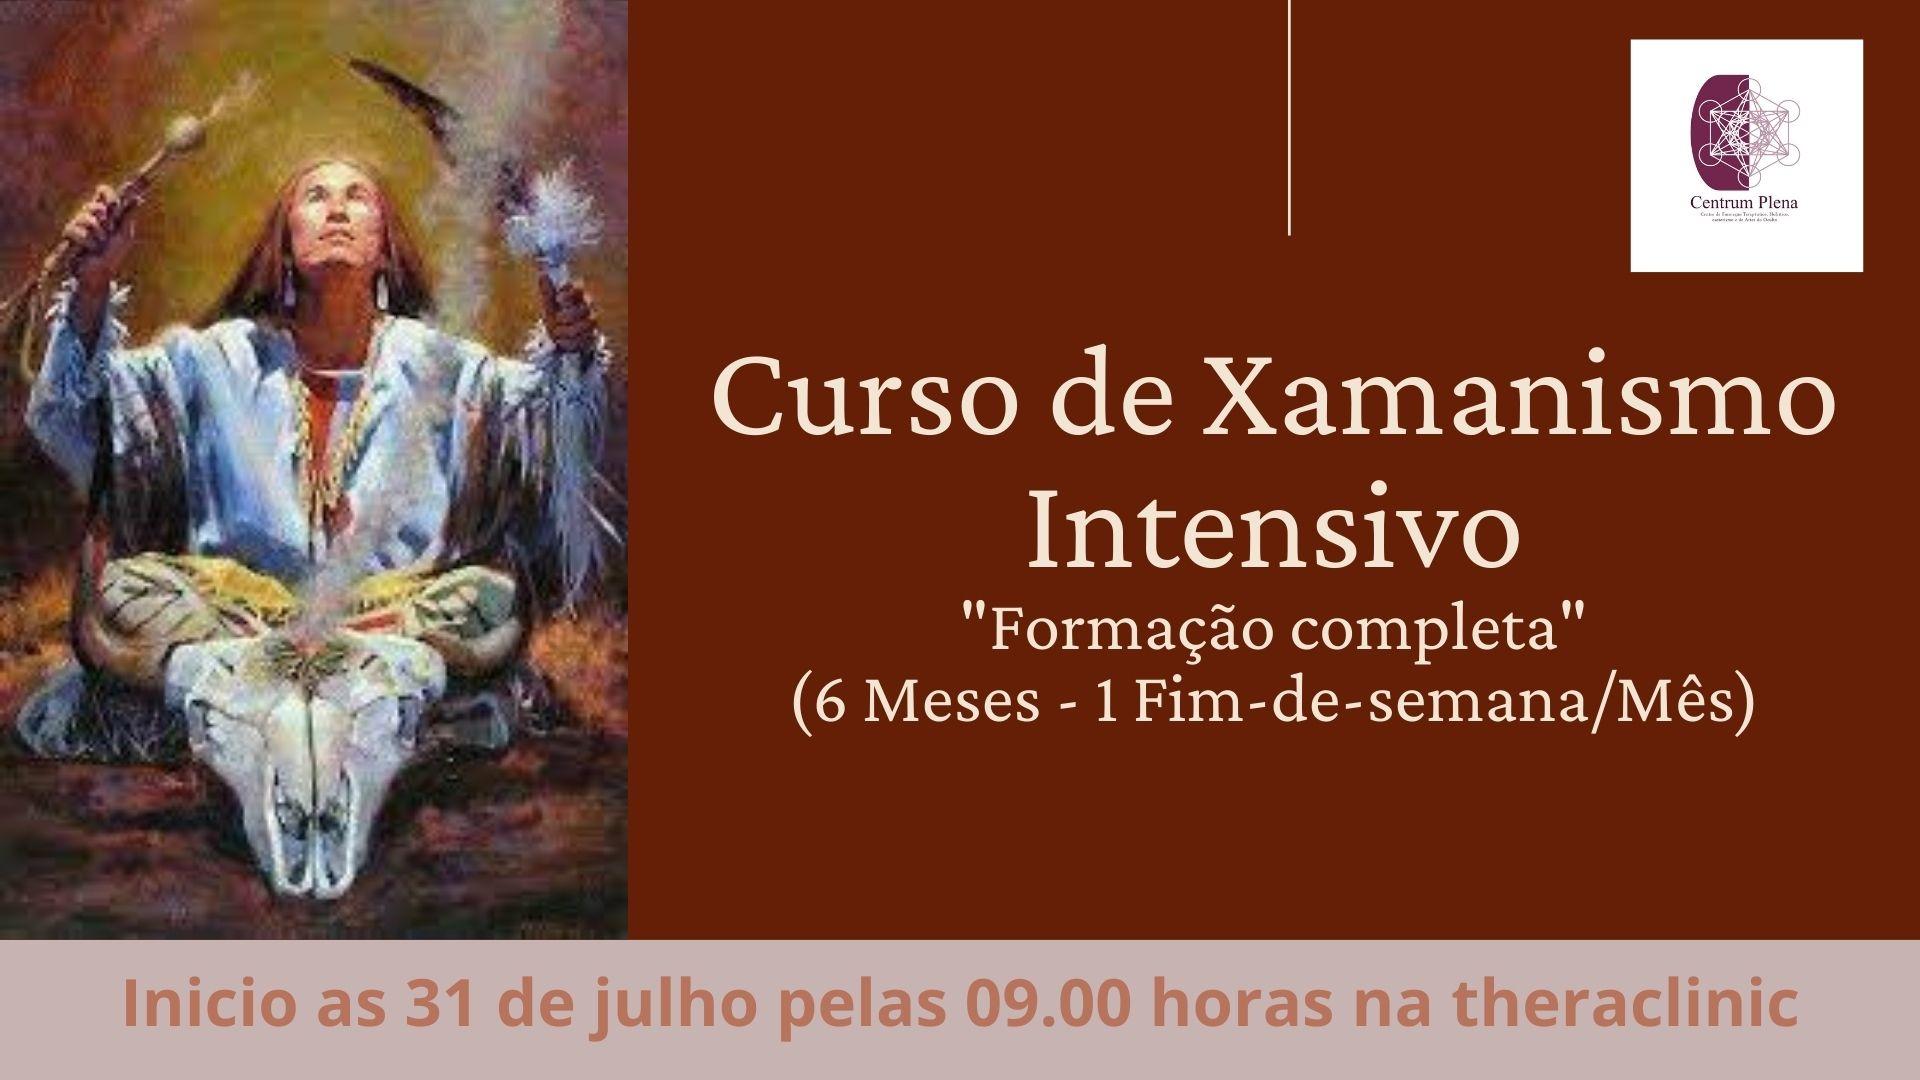 Curso de Xamanismo Intensivo - Início dia 31 de Julho (6 Meses)